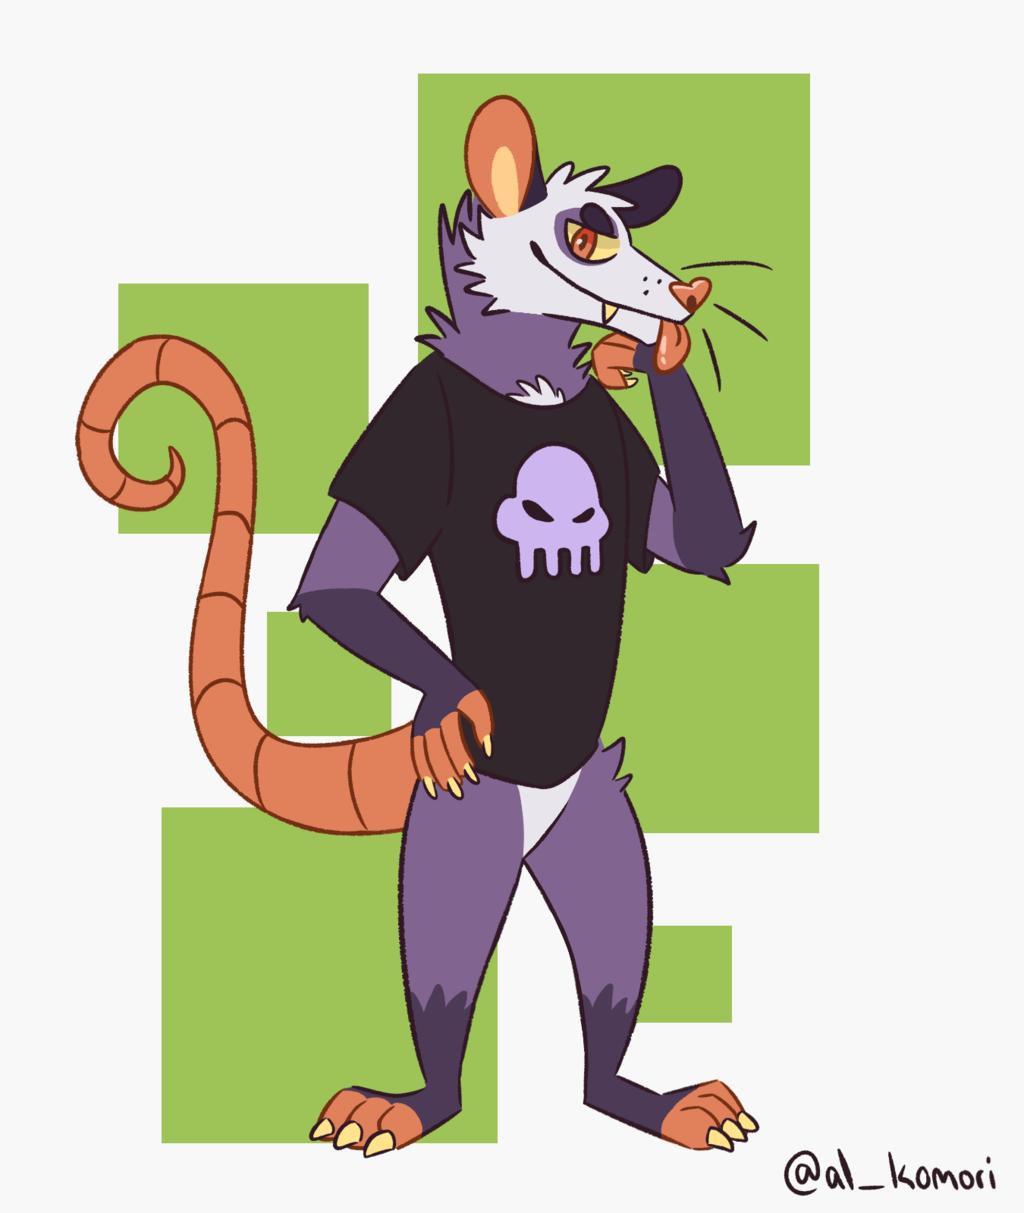 Most recent image: Possum Boi